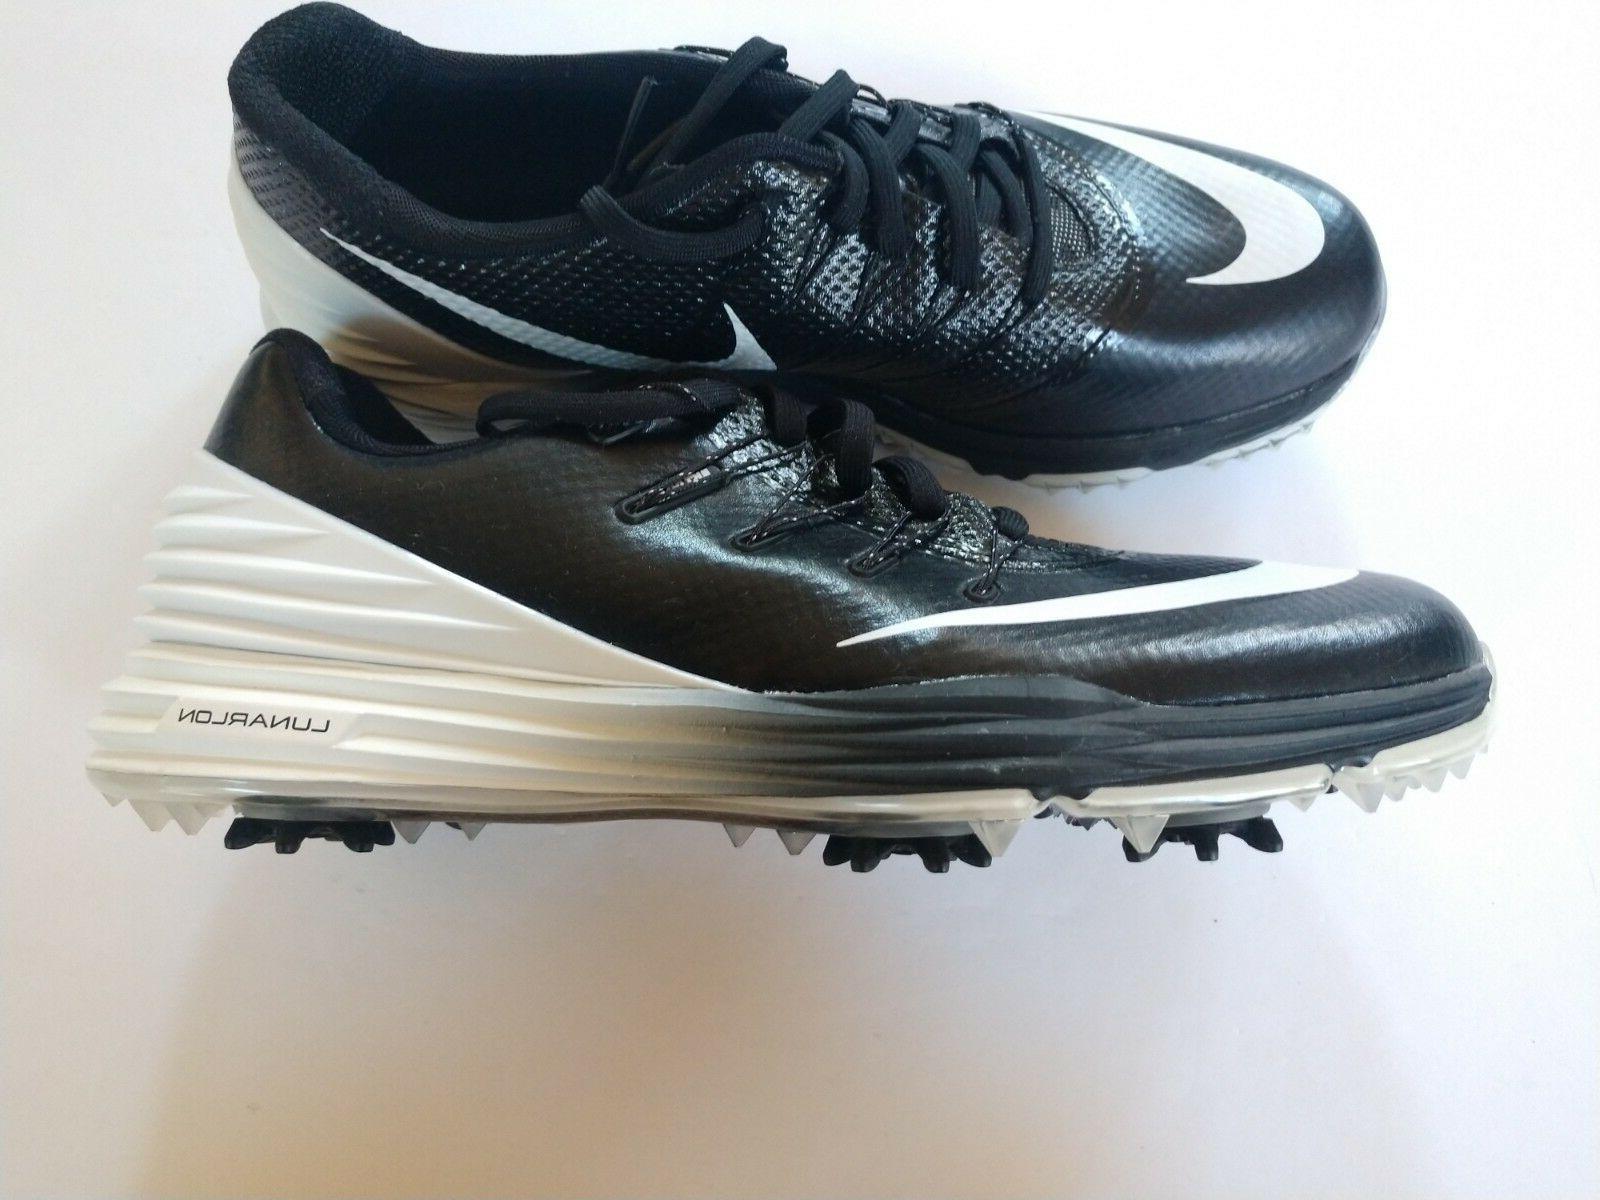 NEW Nike Women's Control Black White size 7.5